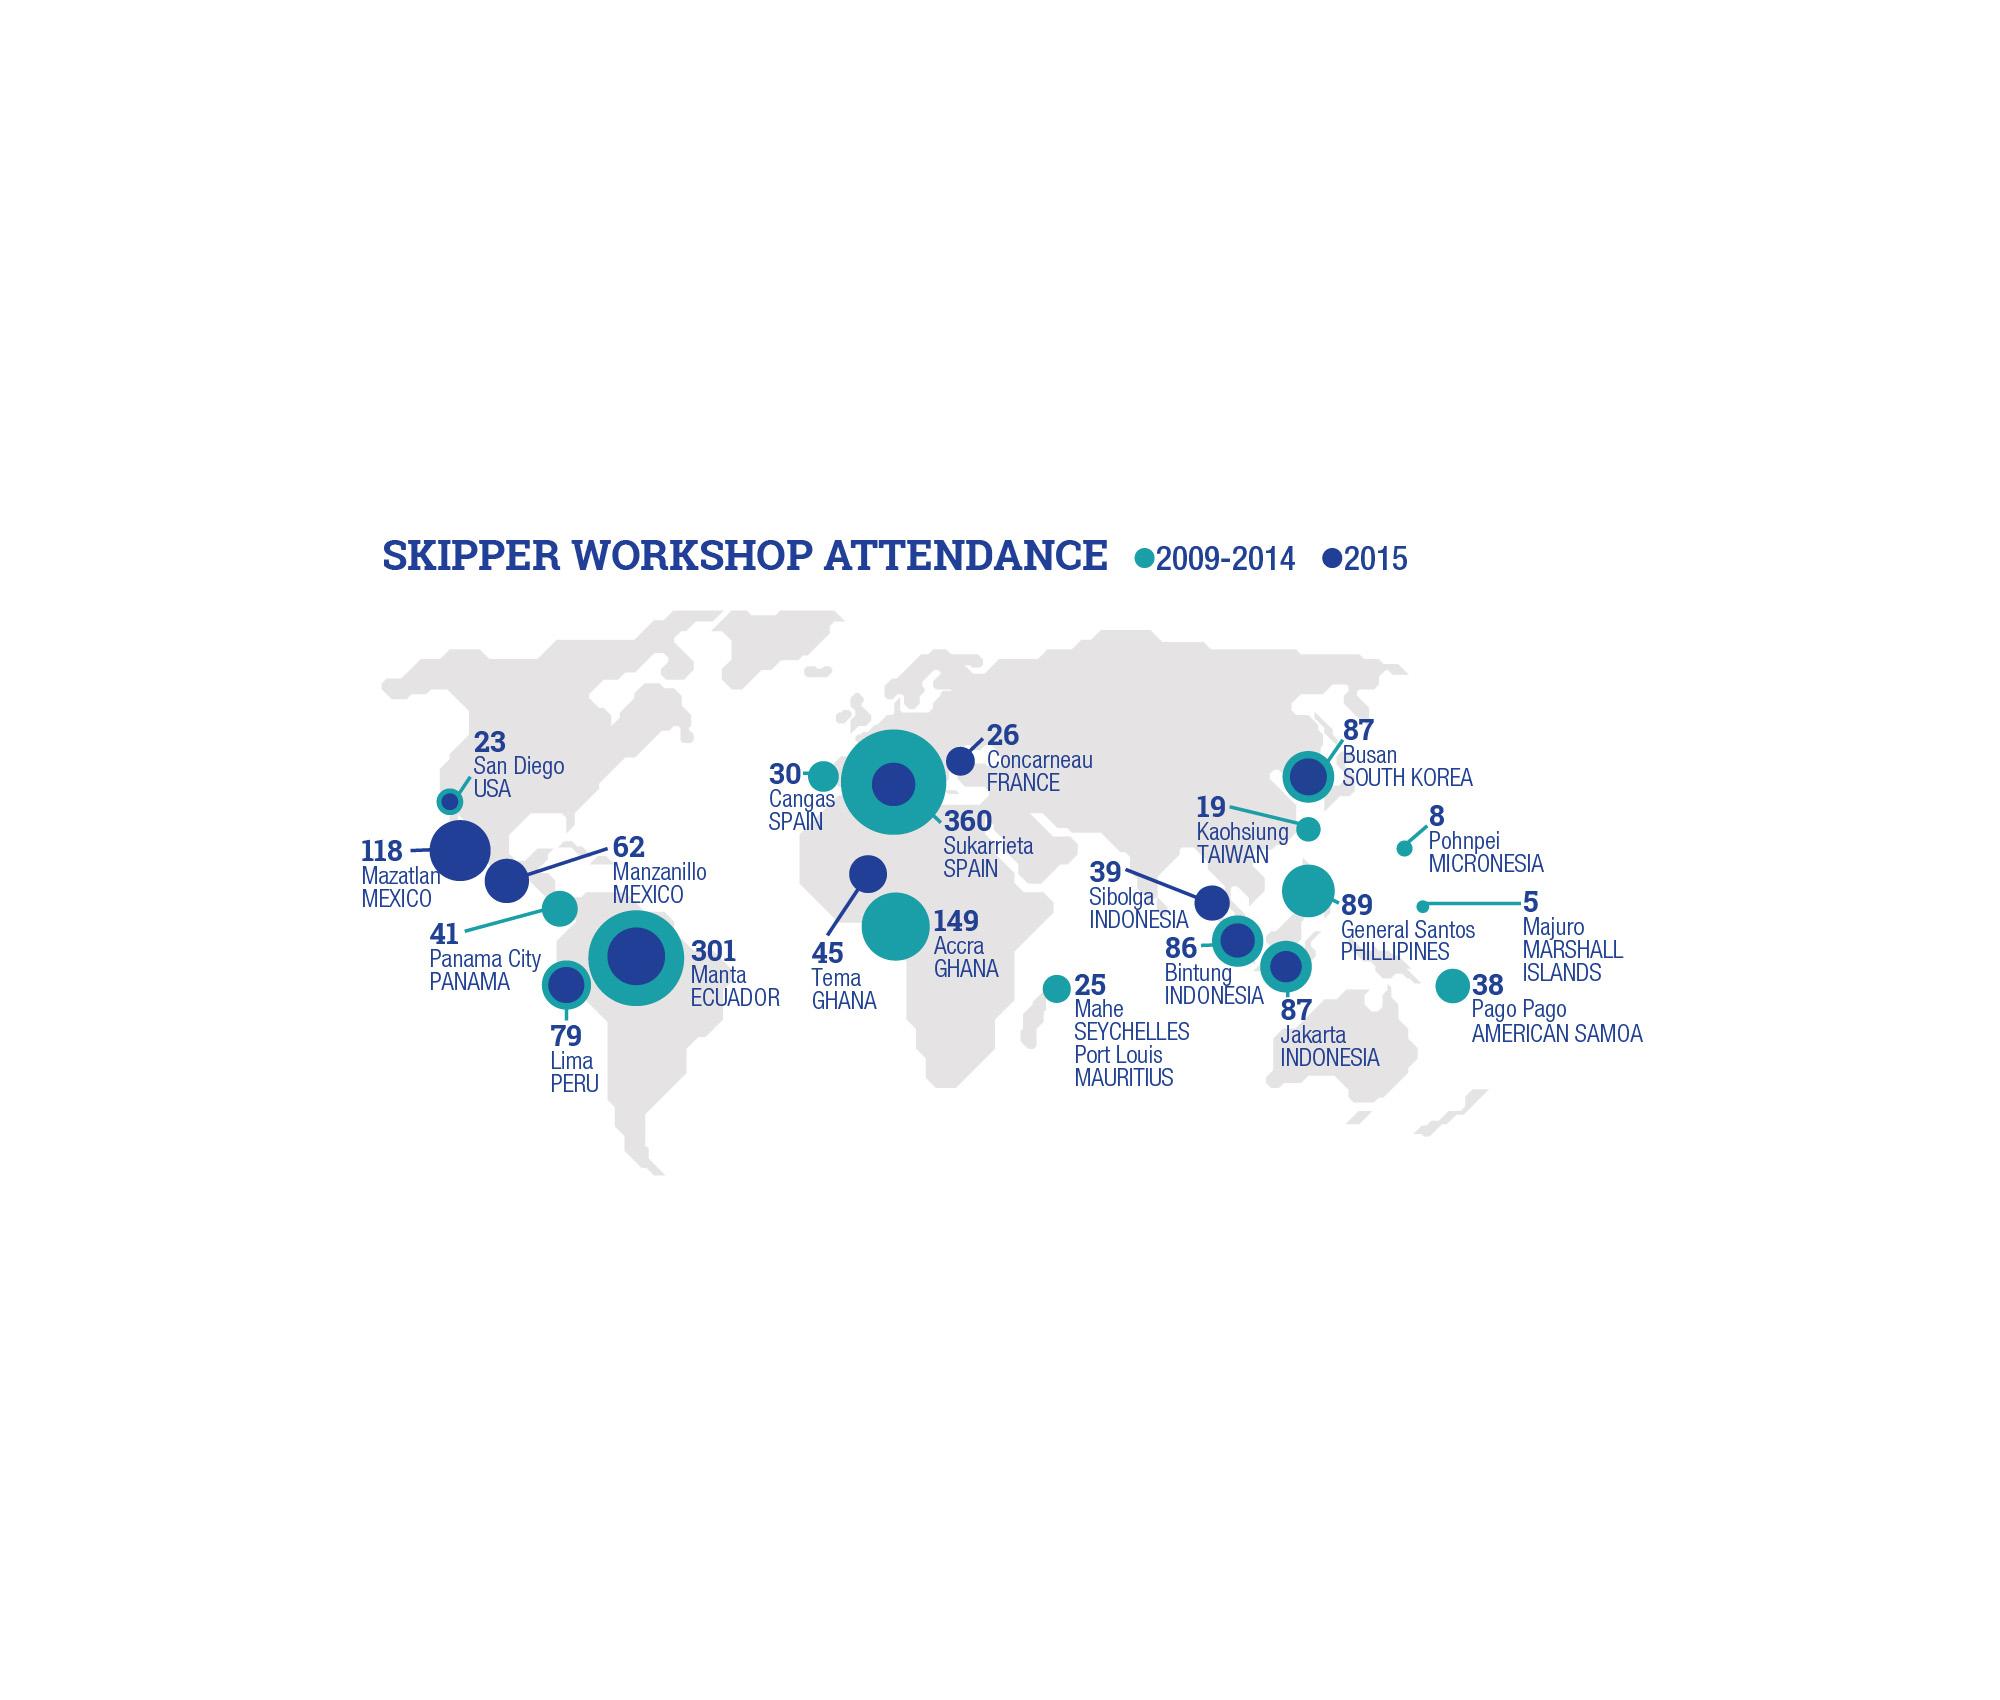 Map of ISSF's global skipper workshops attendance